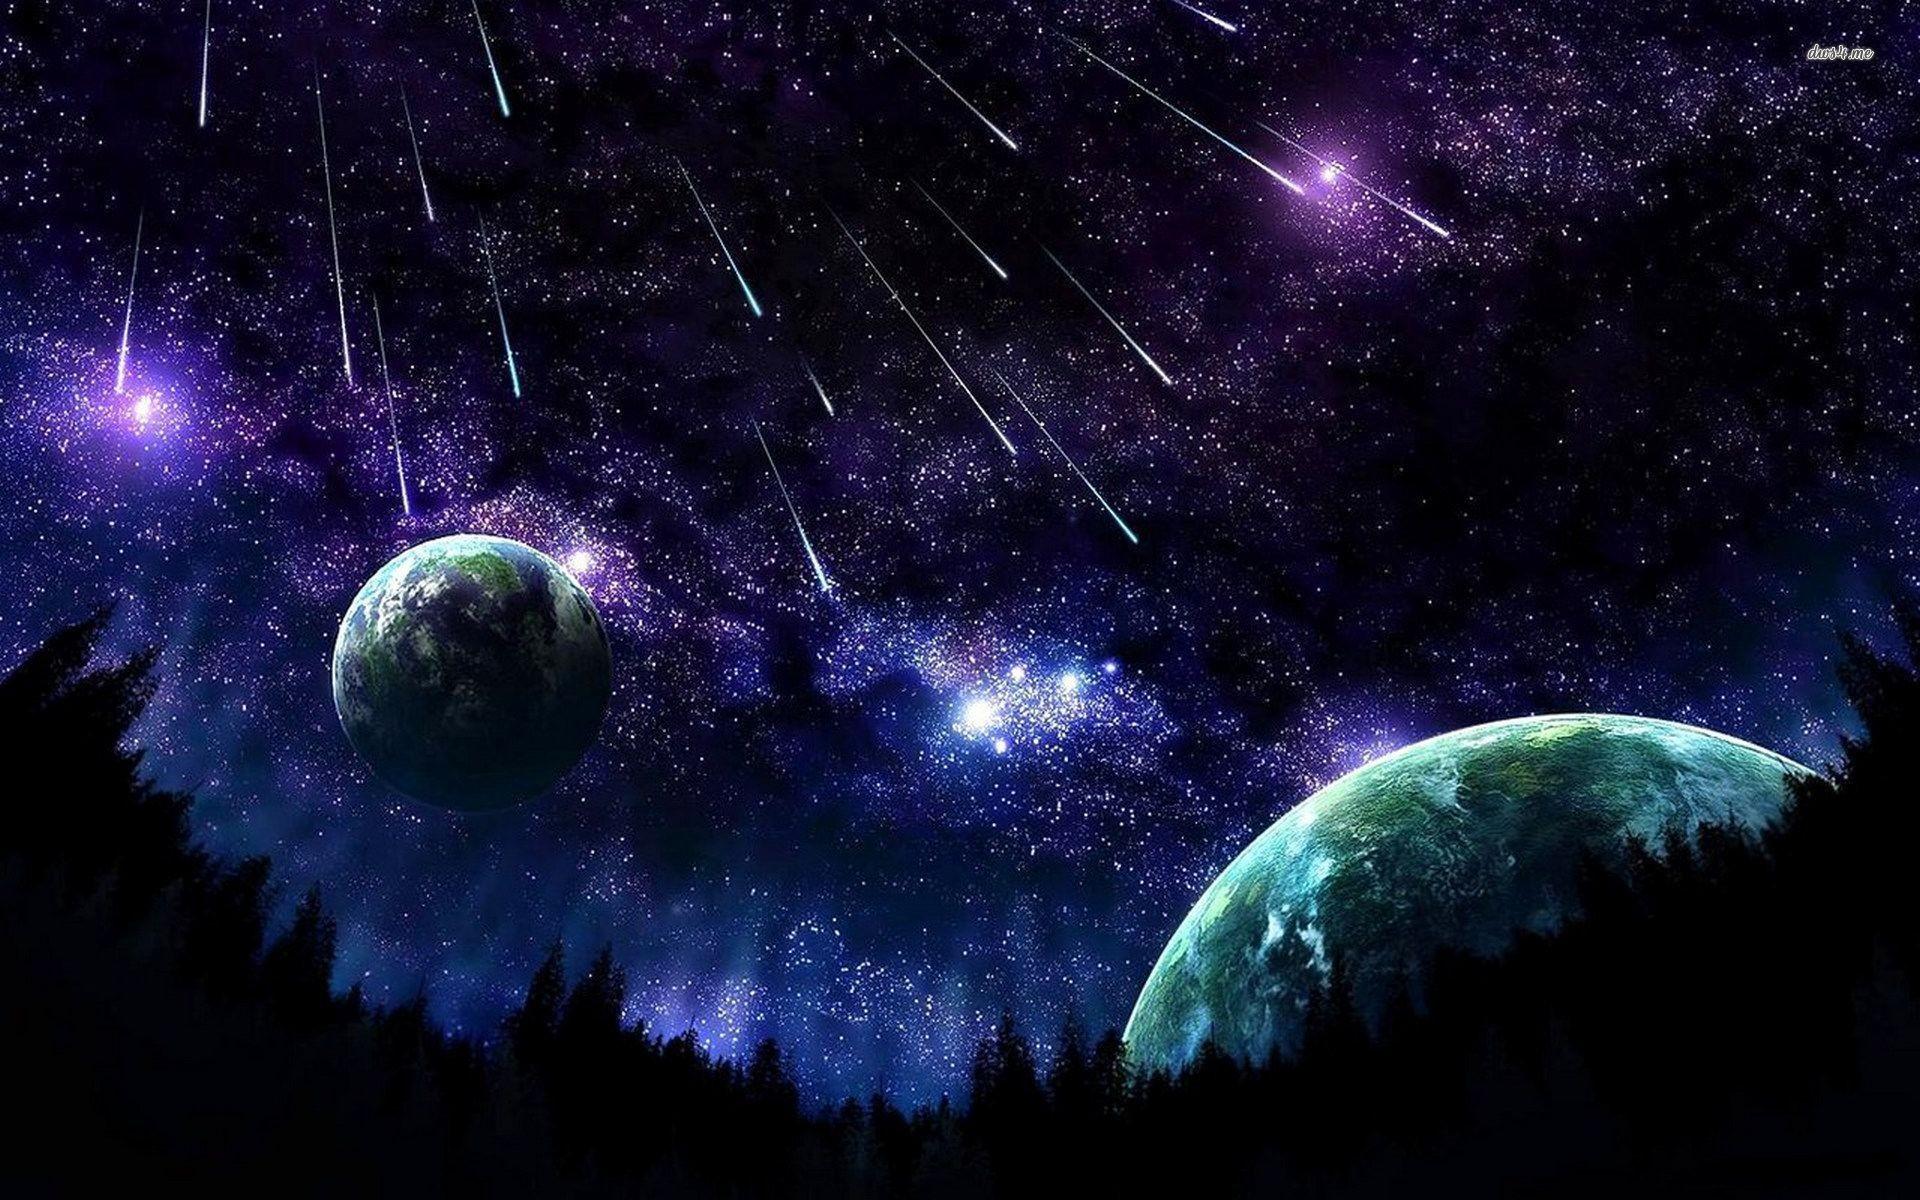 Animated Night Sky Wallpaper